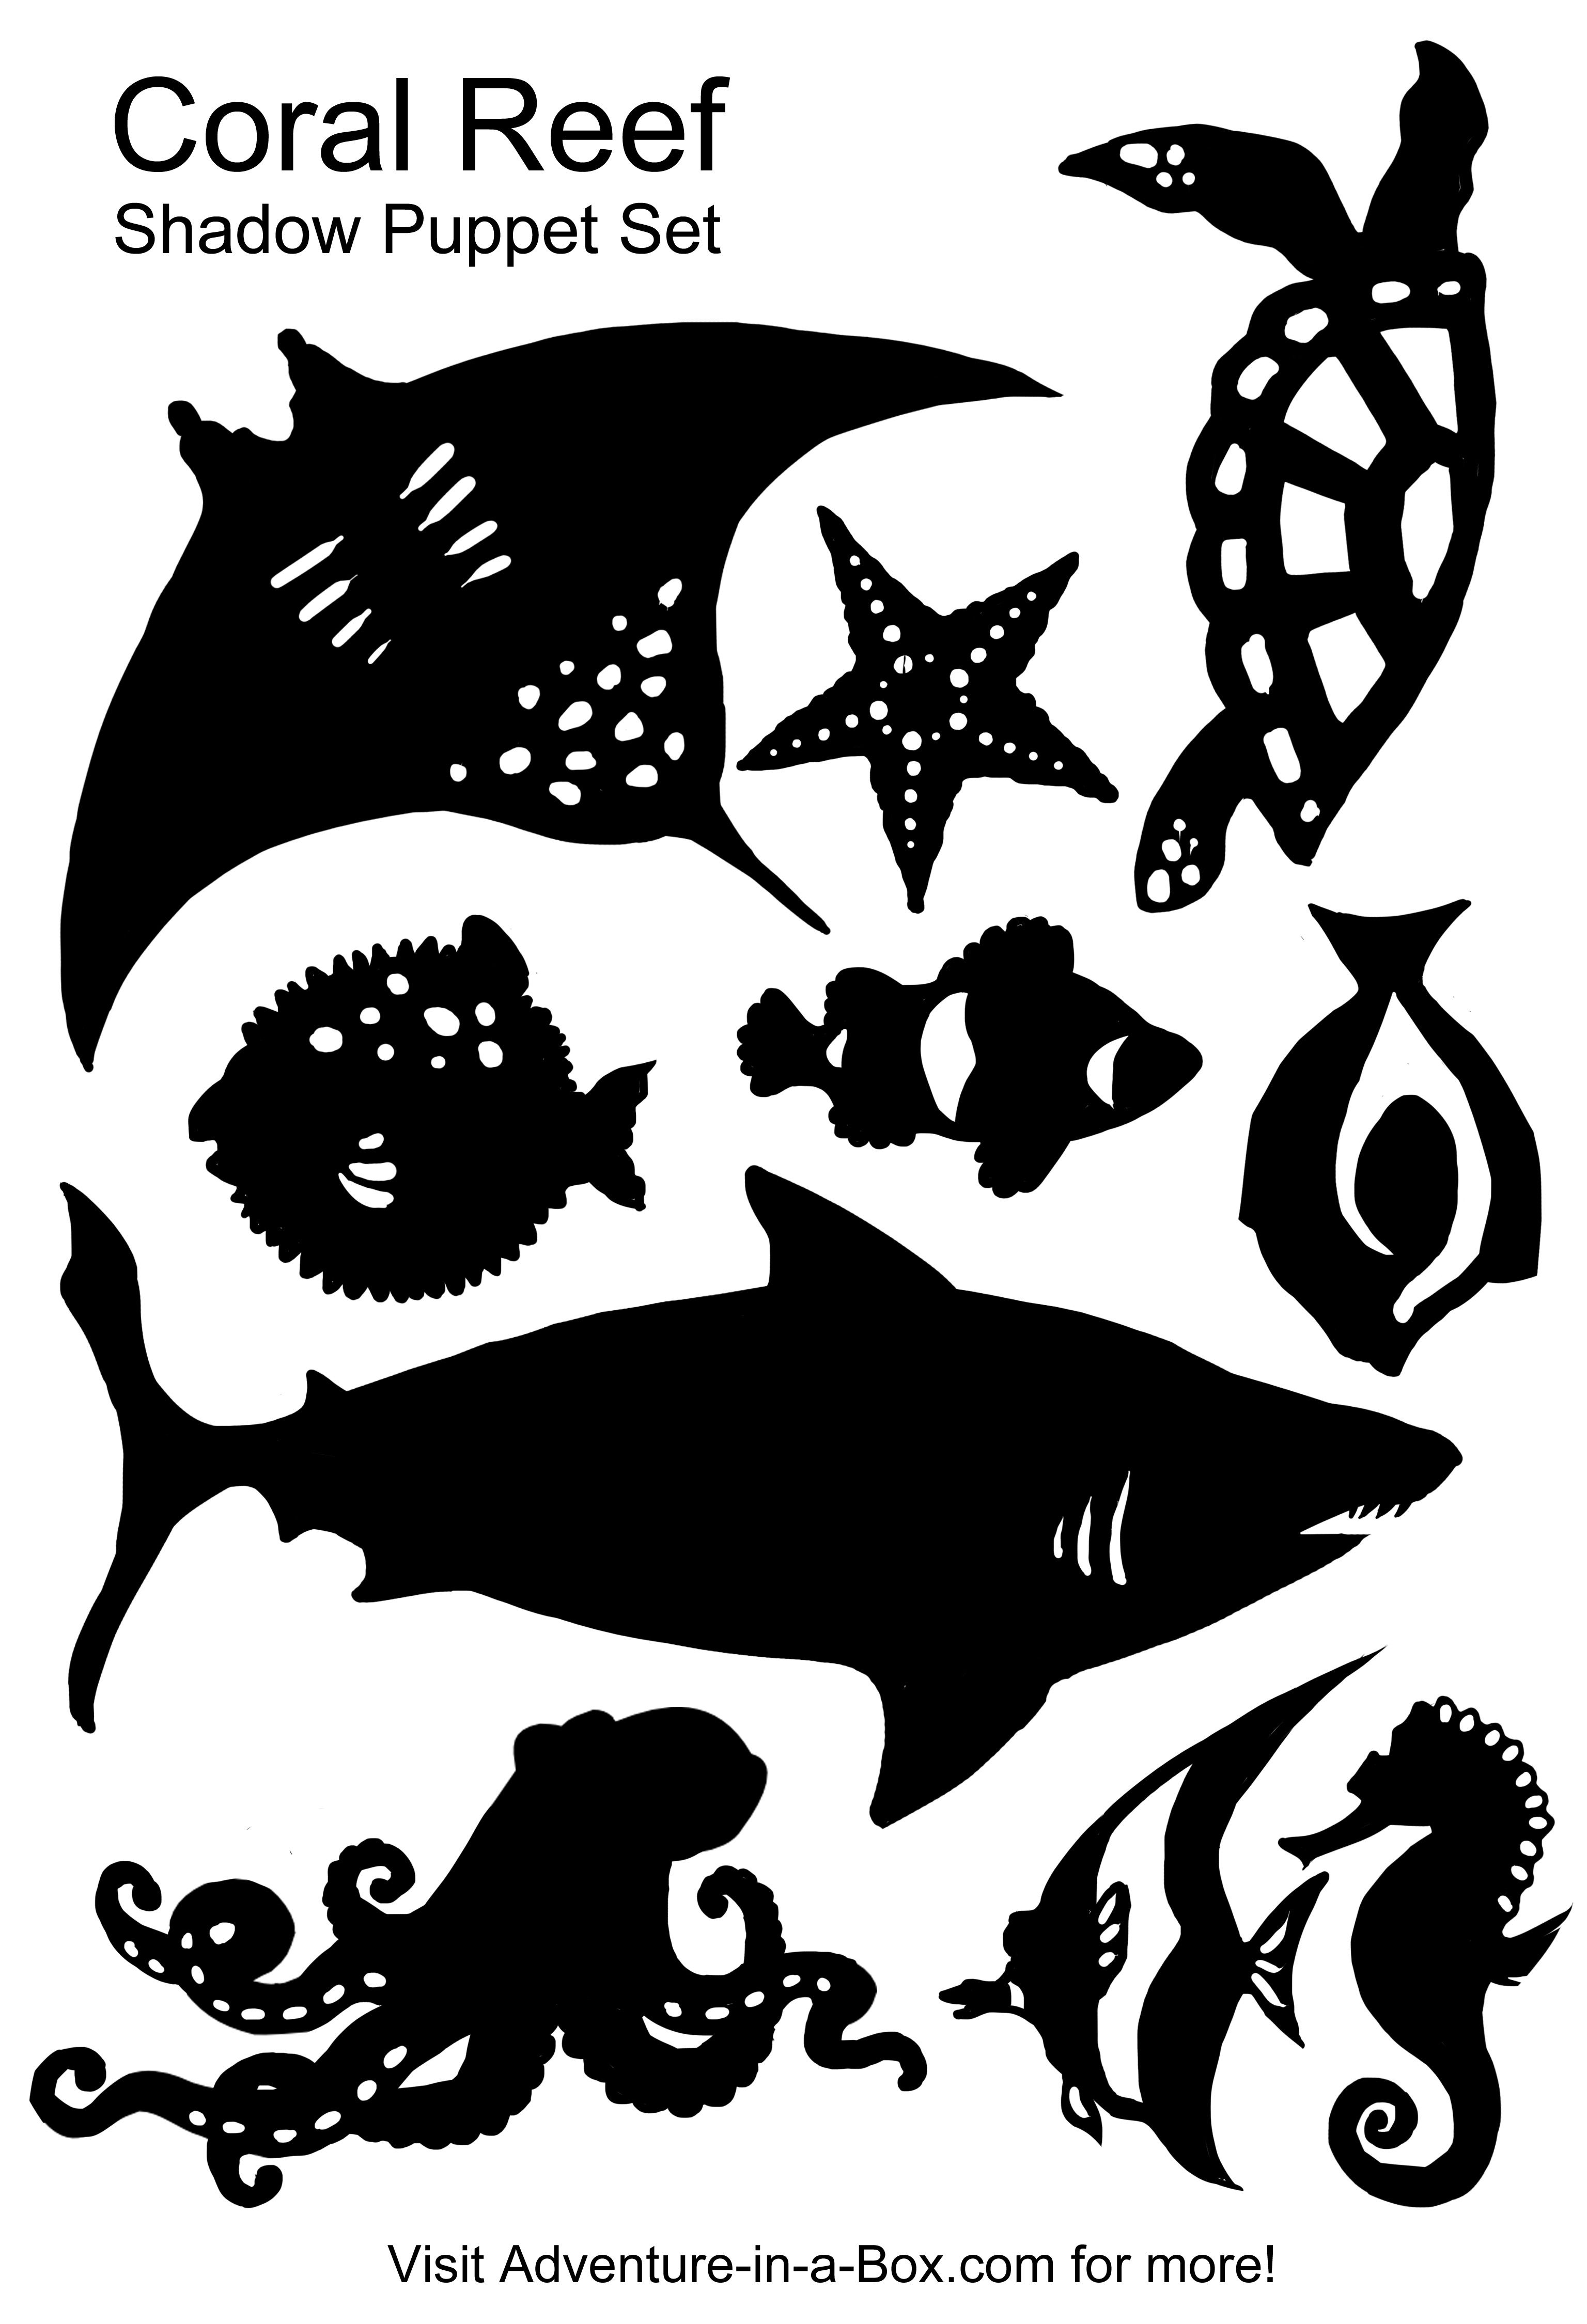 Free jpg shadow puppet templates turtle shark octopus seahorse free jpg shadow puppet templates turtle shark octopus seahorse puffer fish angel fish ray clown fish pronofoot35fo Gallery